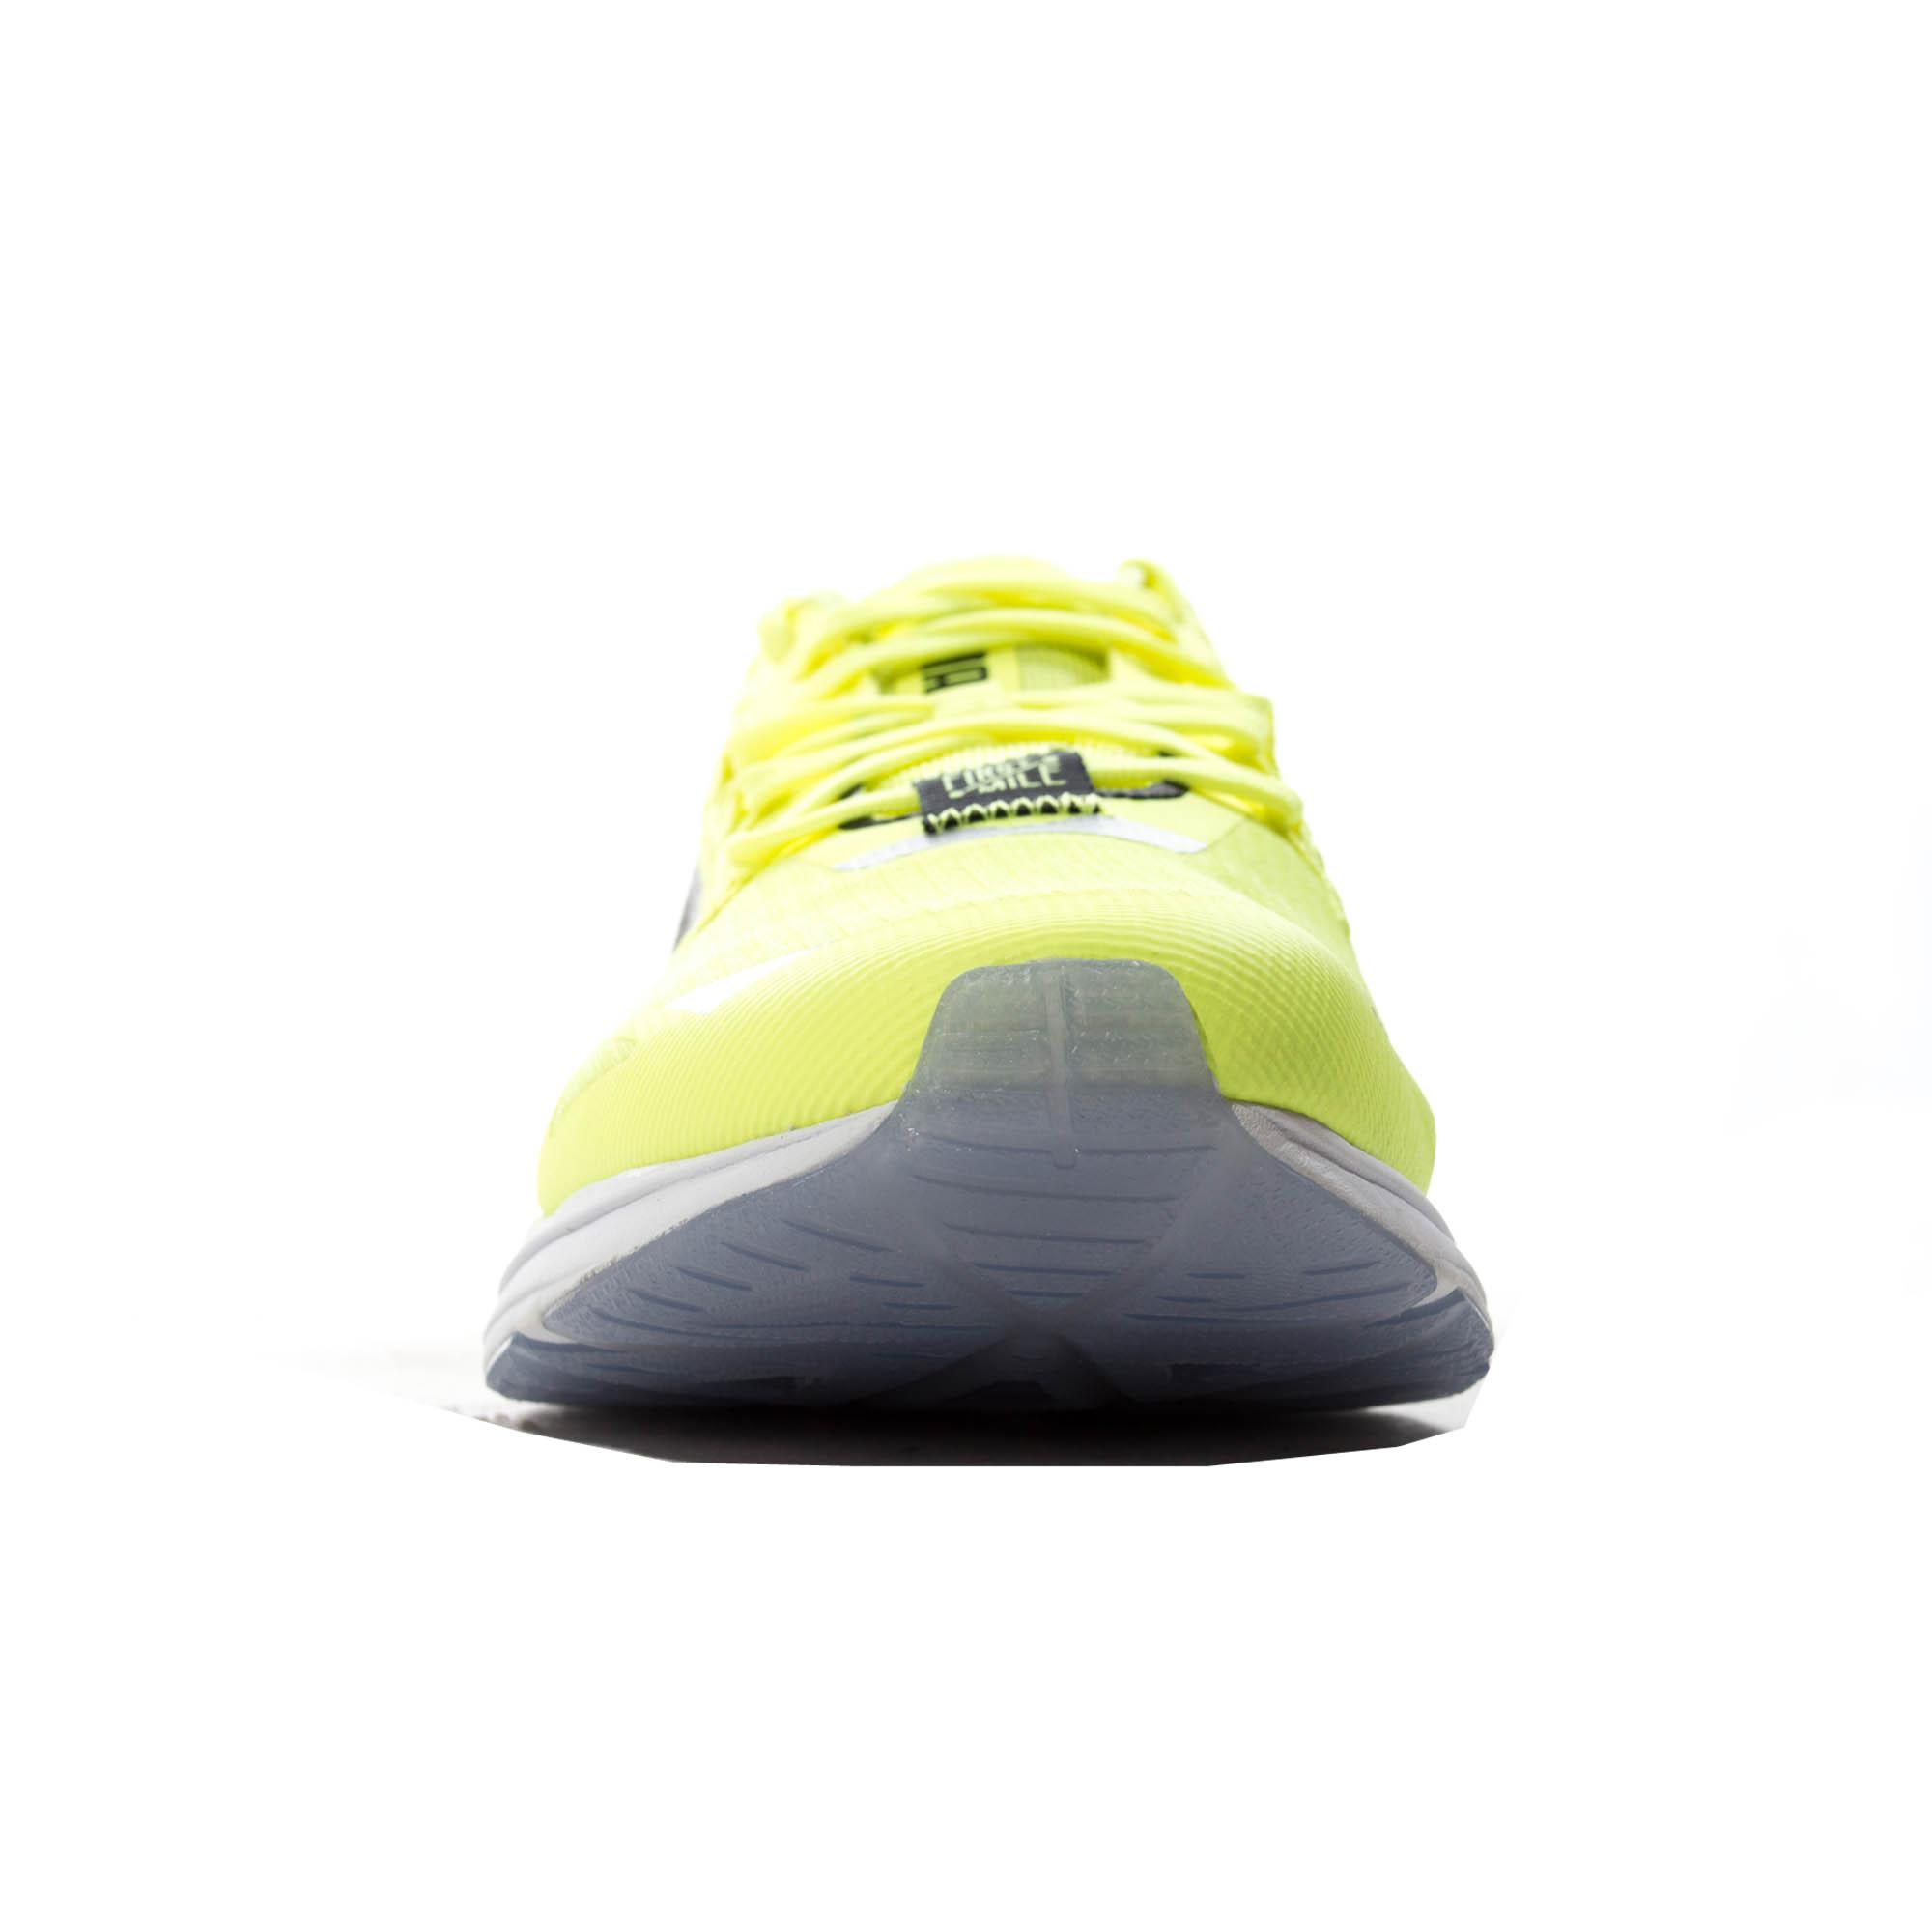 miniature 9 - Puma ultraride FM XTREME Homme Running Fitness Training Trainer Chaussure Jaune